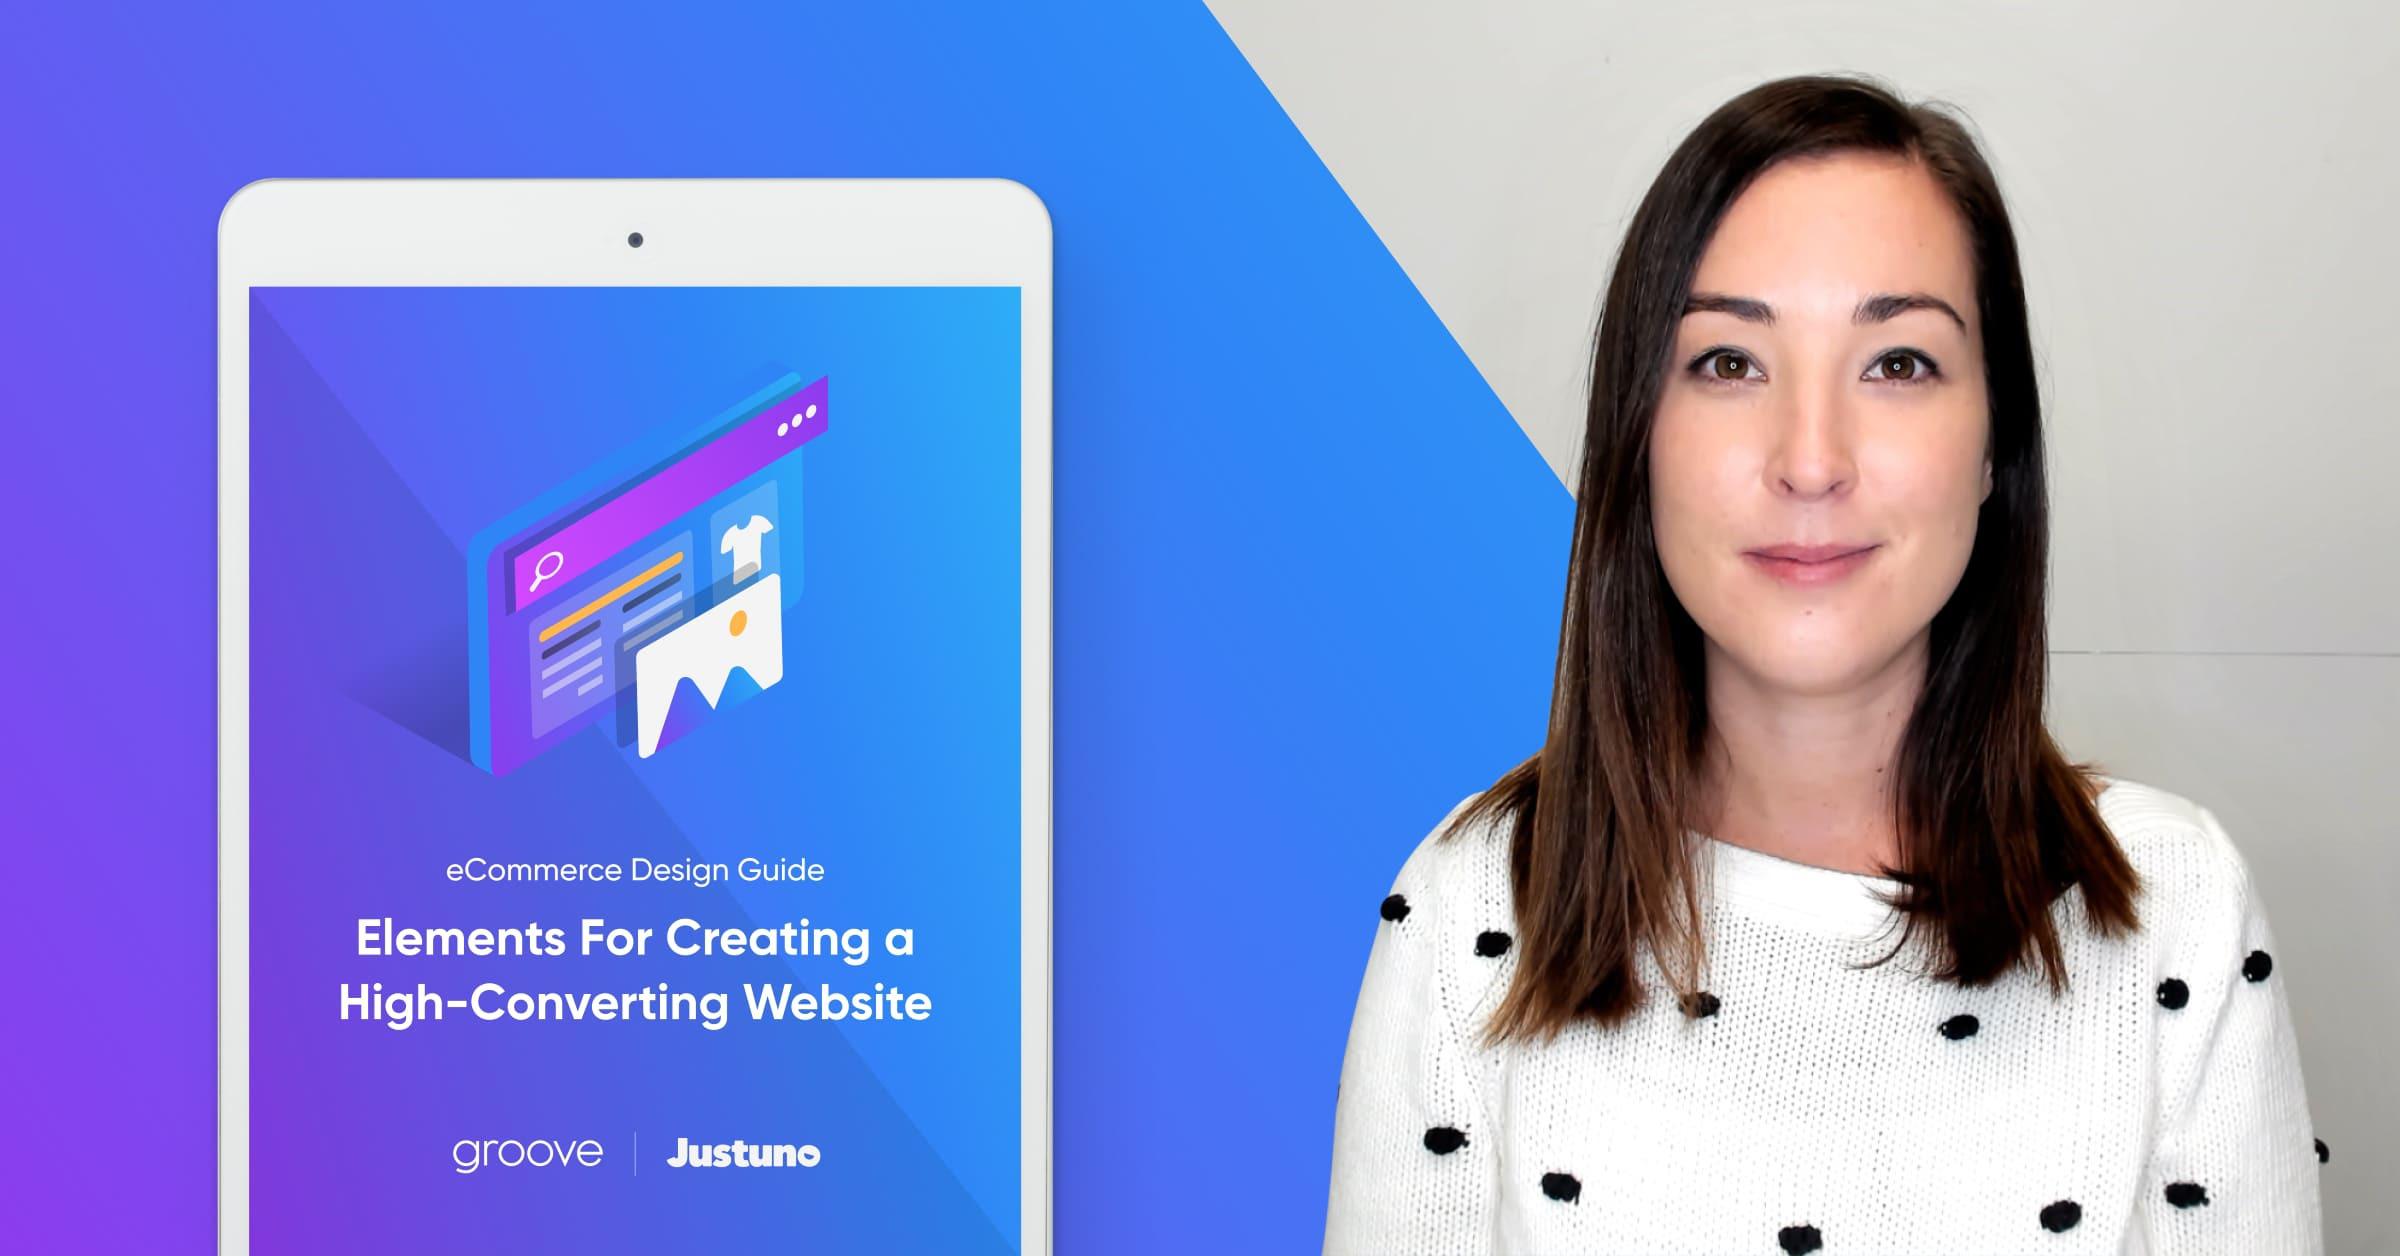 eCommerce Design Guide Promo Video